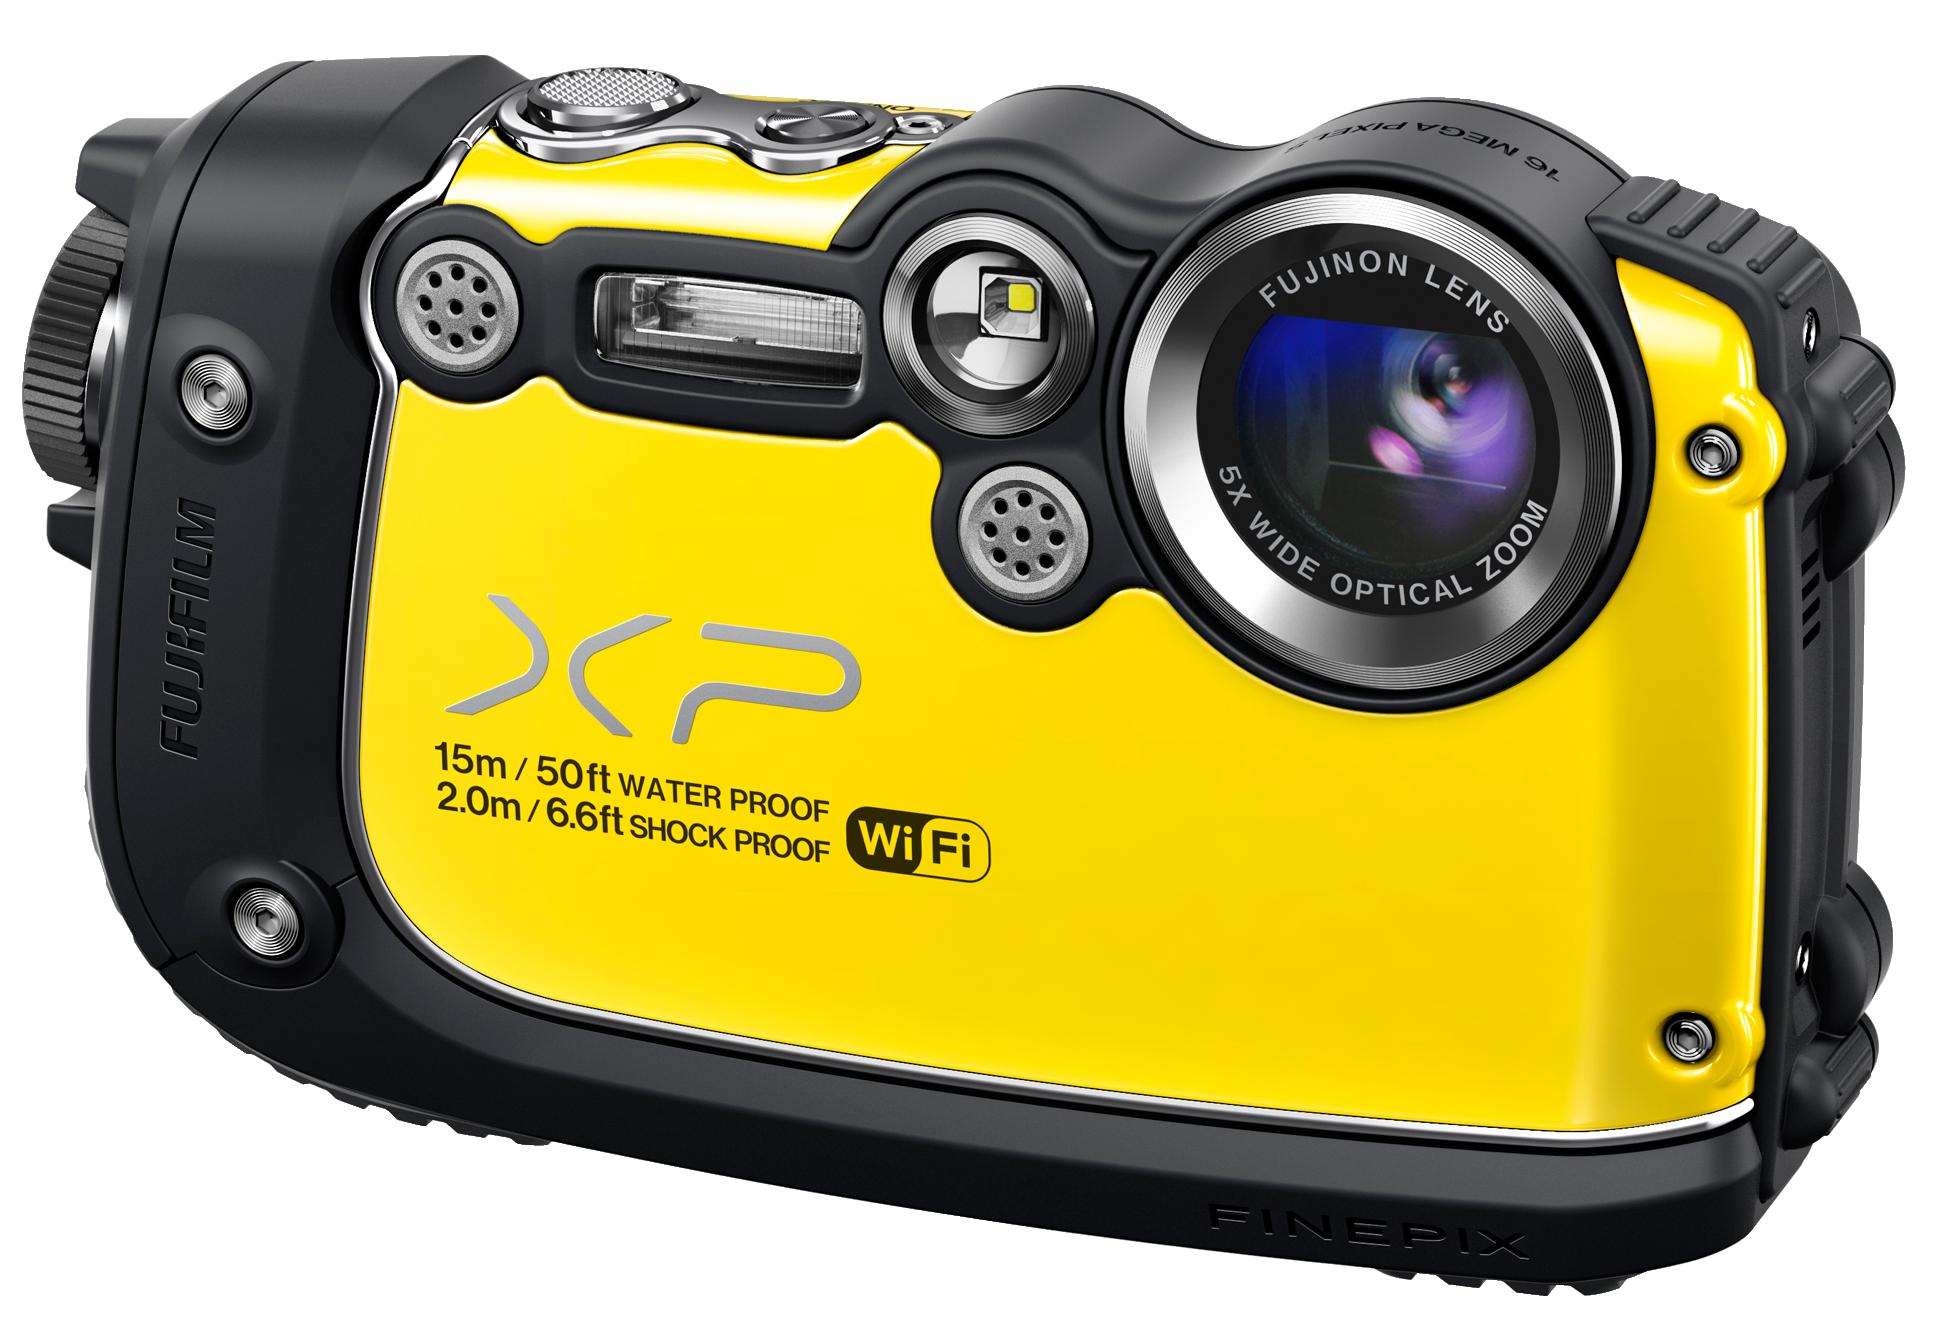 Fujifilm FinePix XP200: Digital Photography Review